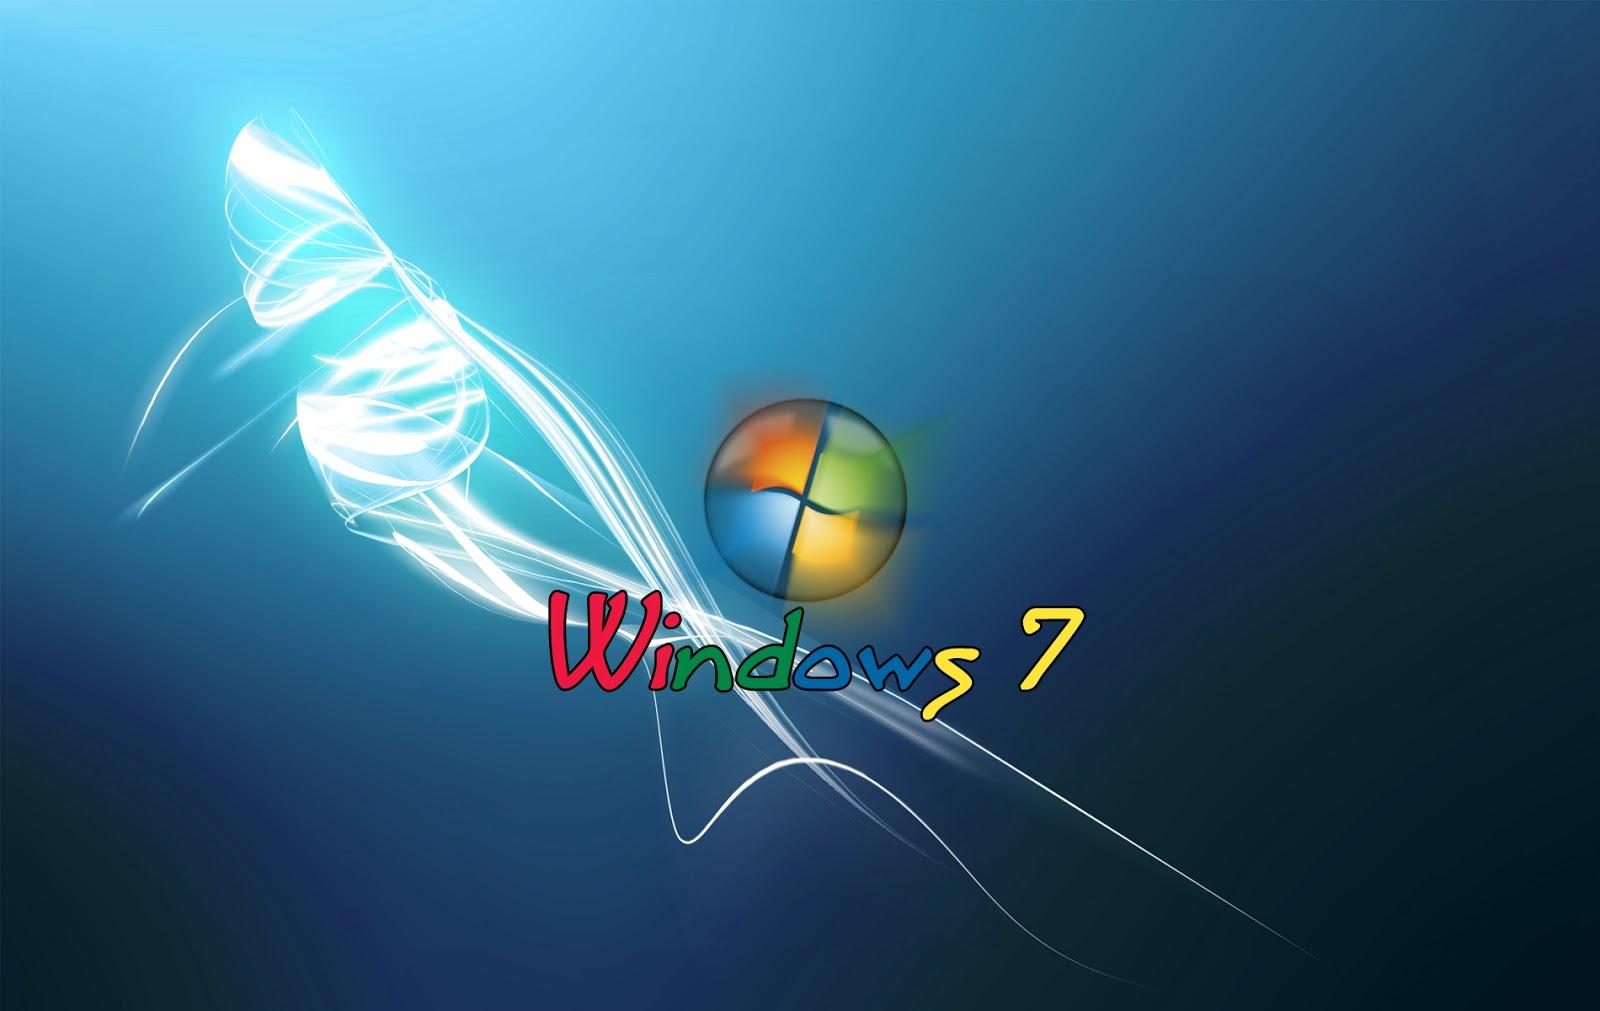 Imagenes zt descarga fondos hd fondo de pantalla mariposa windows 7 - Fondos de escritorio para windows 7 gratis ...